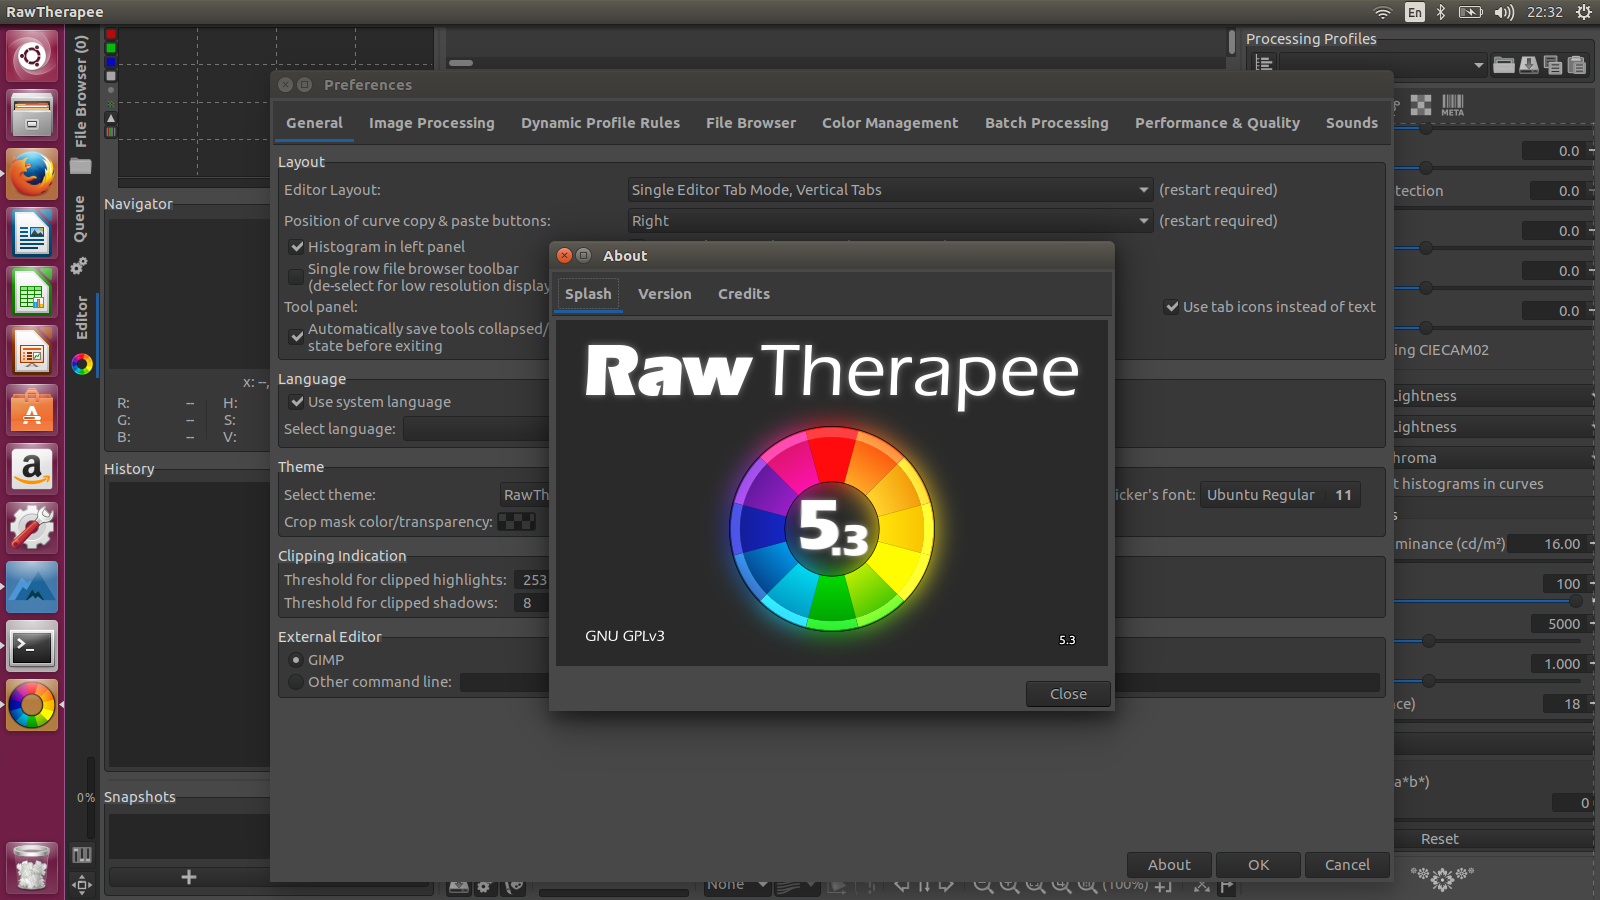 How to install program on Ubuntu: How to Install RawTherapee